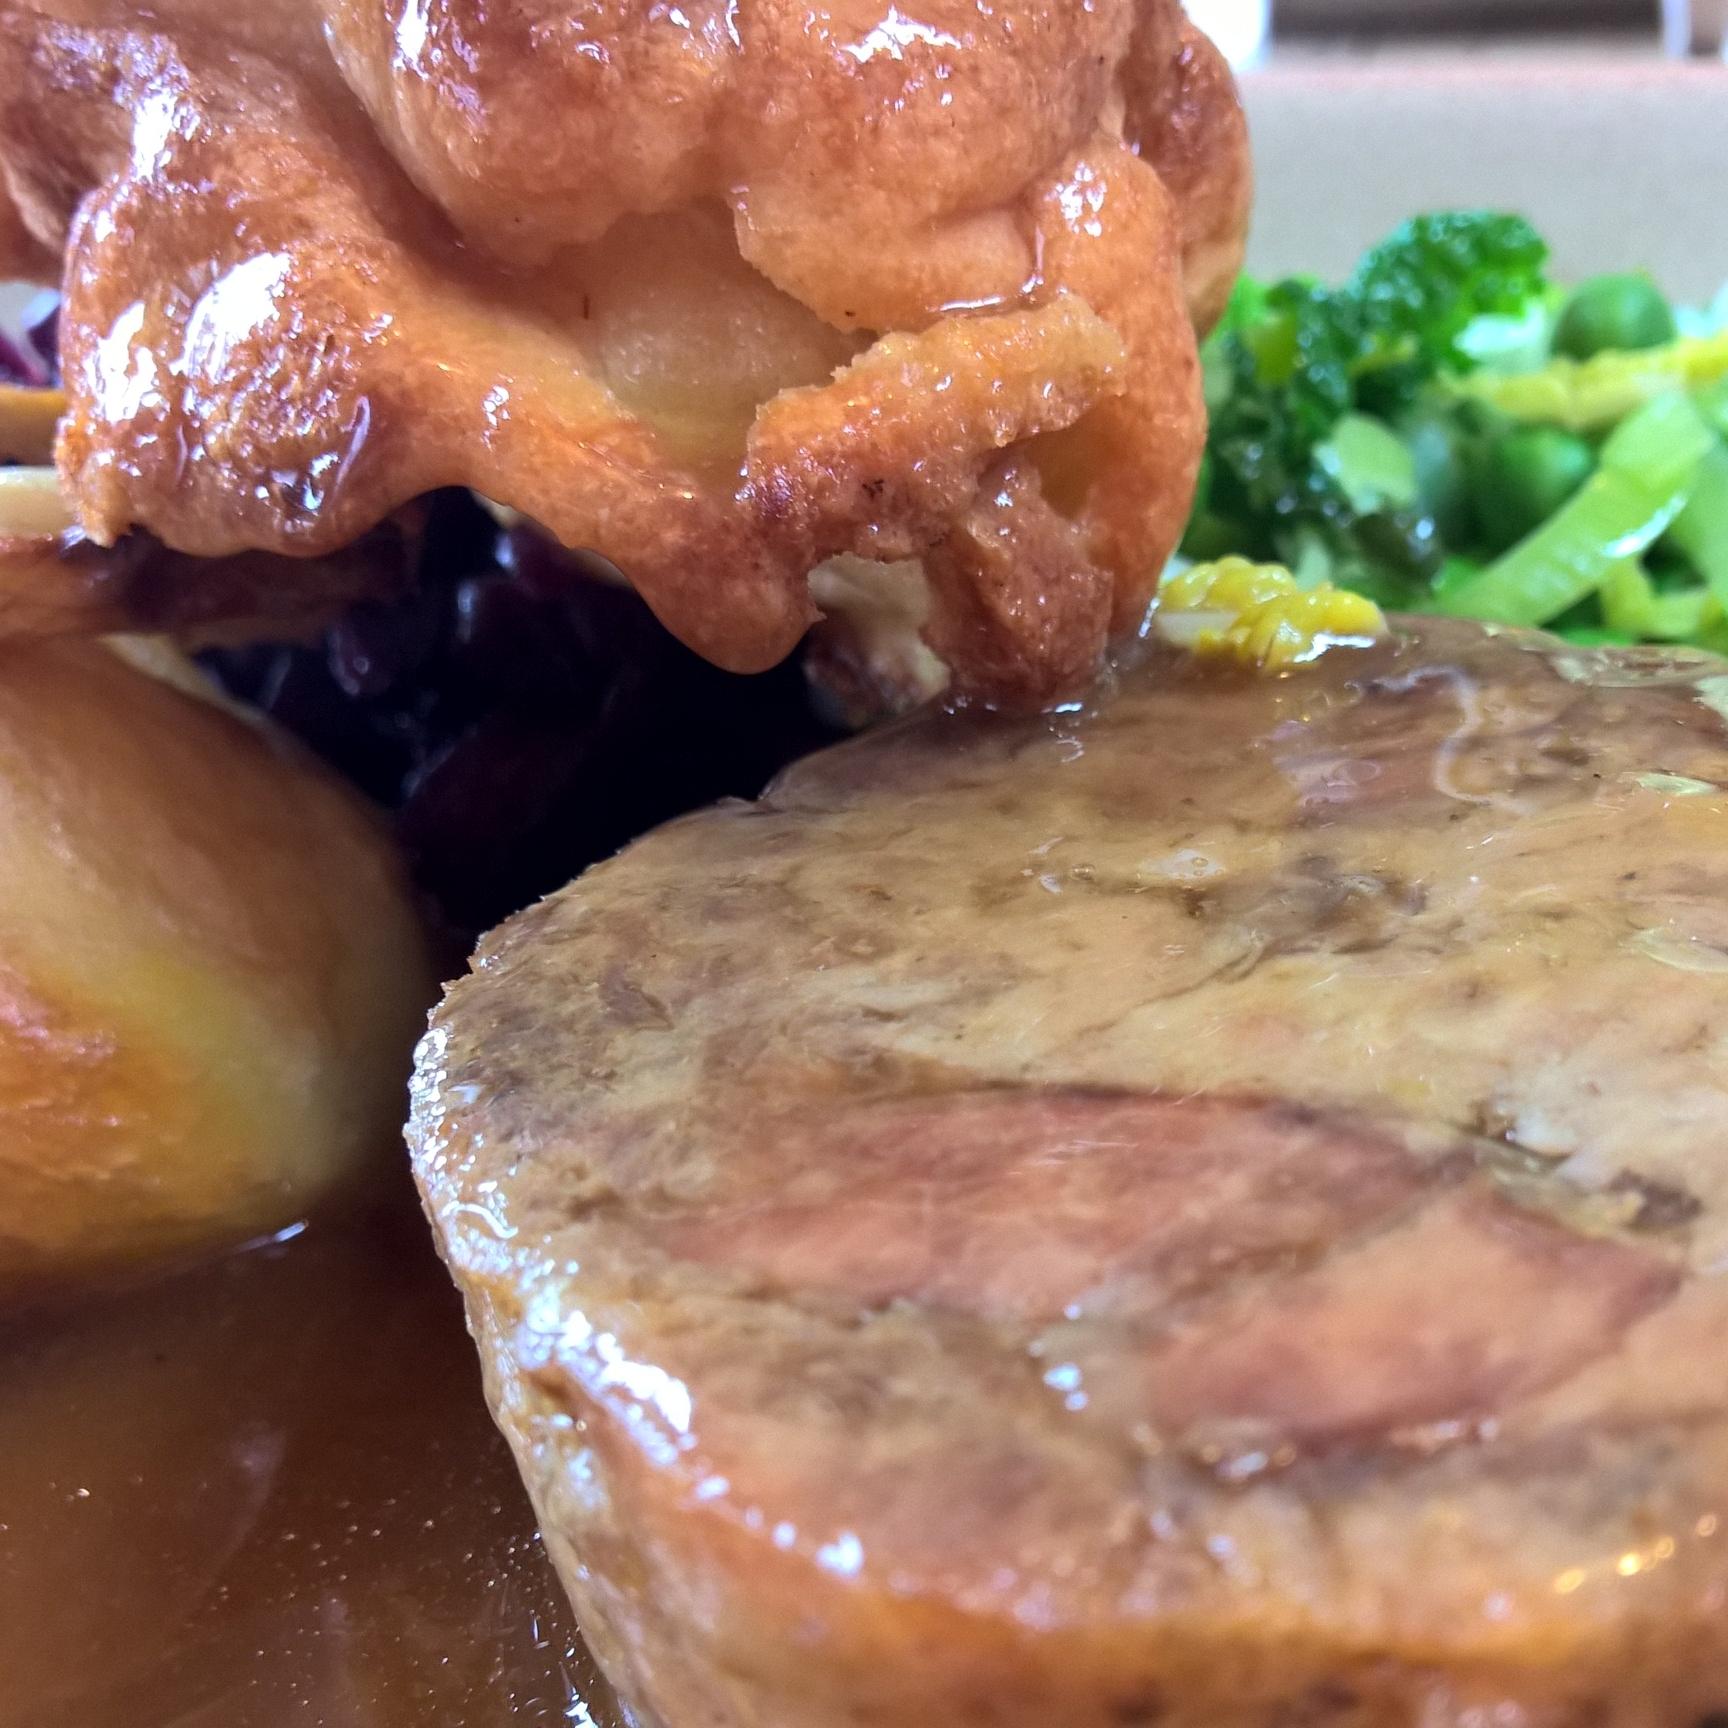 Shoulder of lamb, Sunday Roast